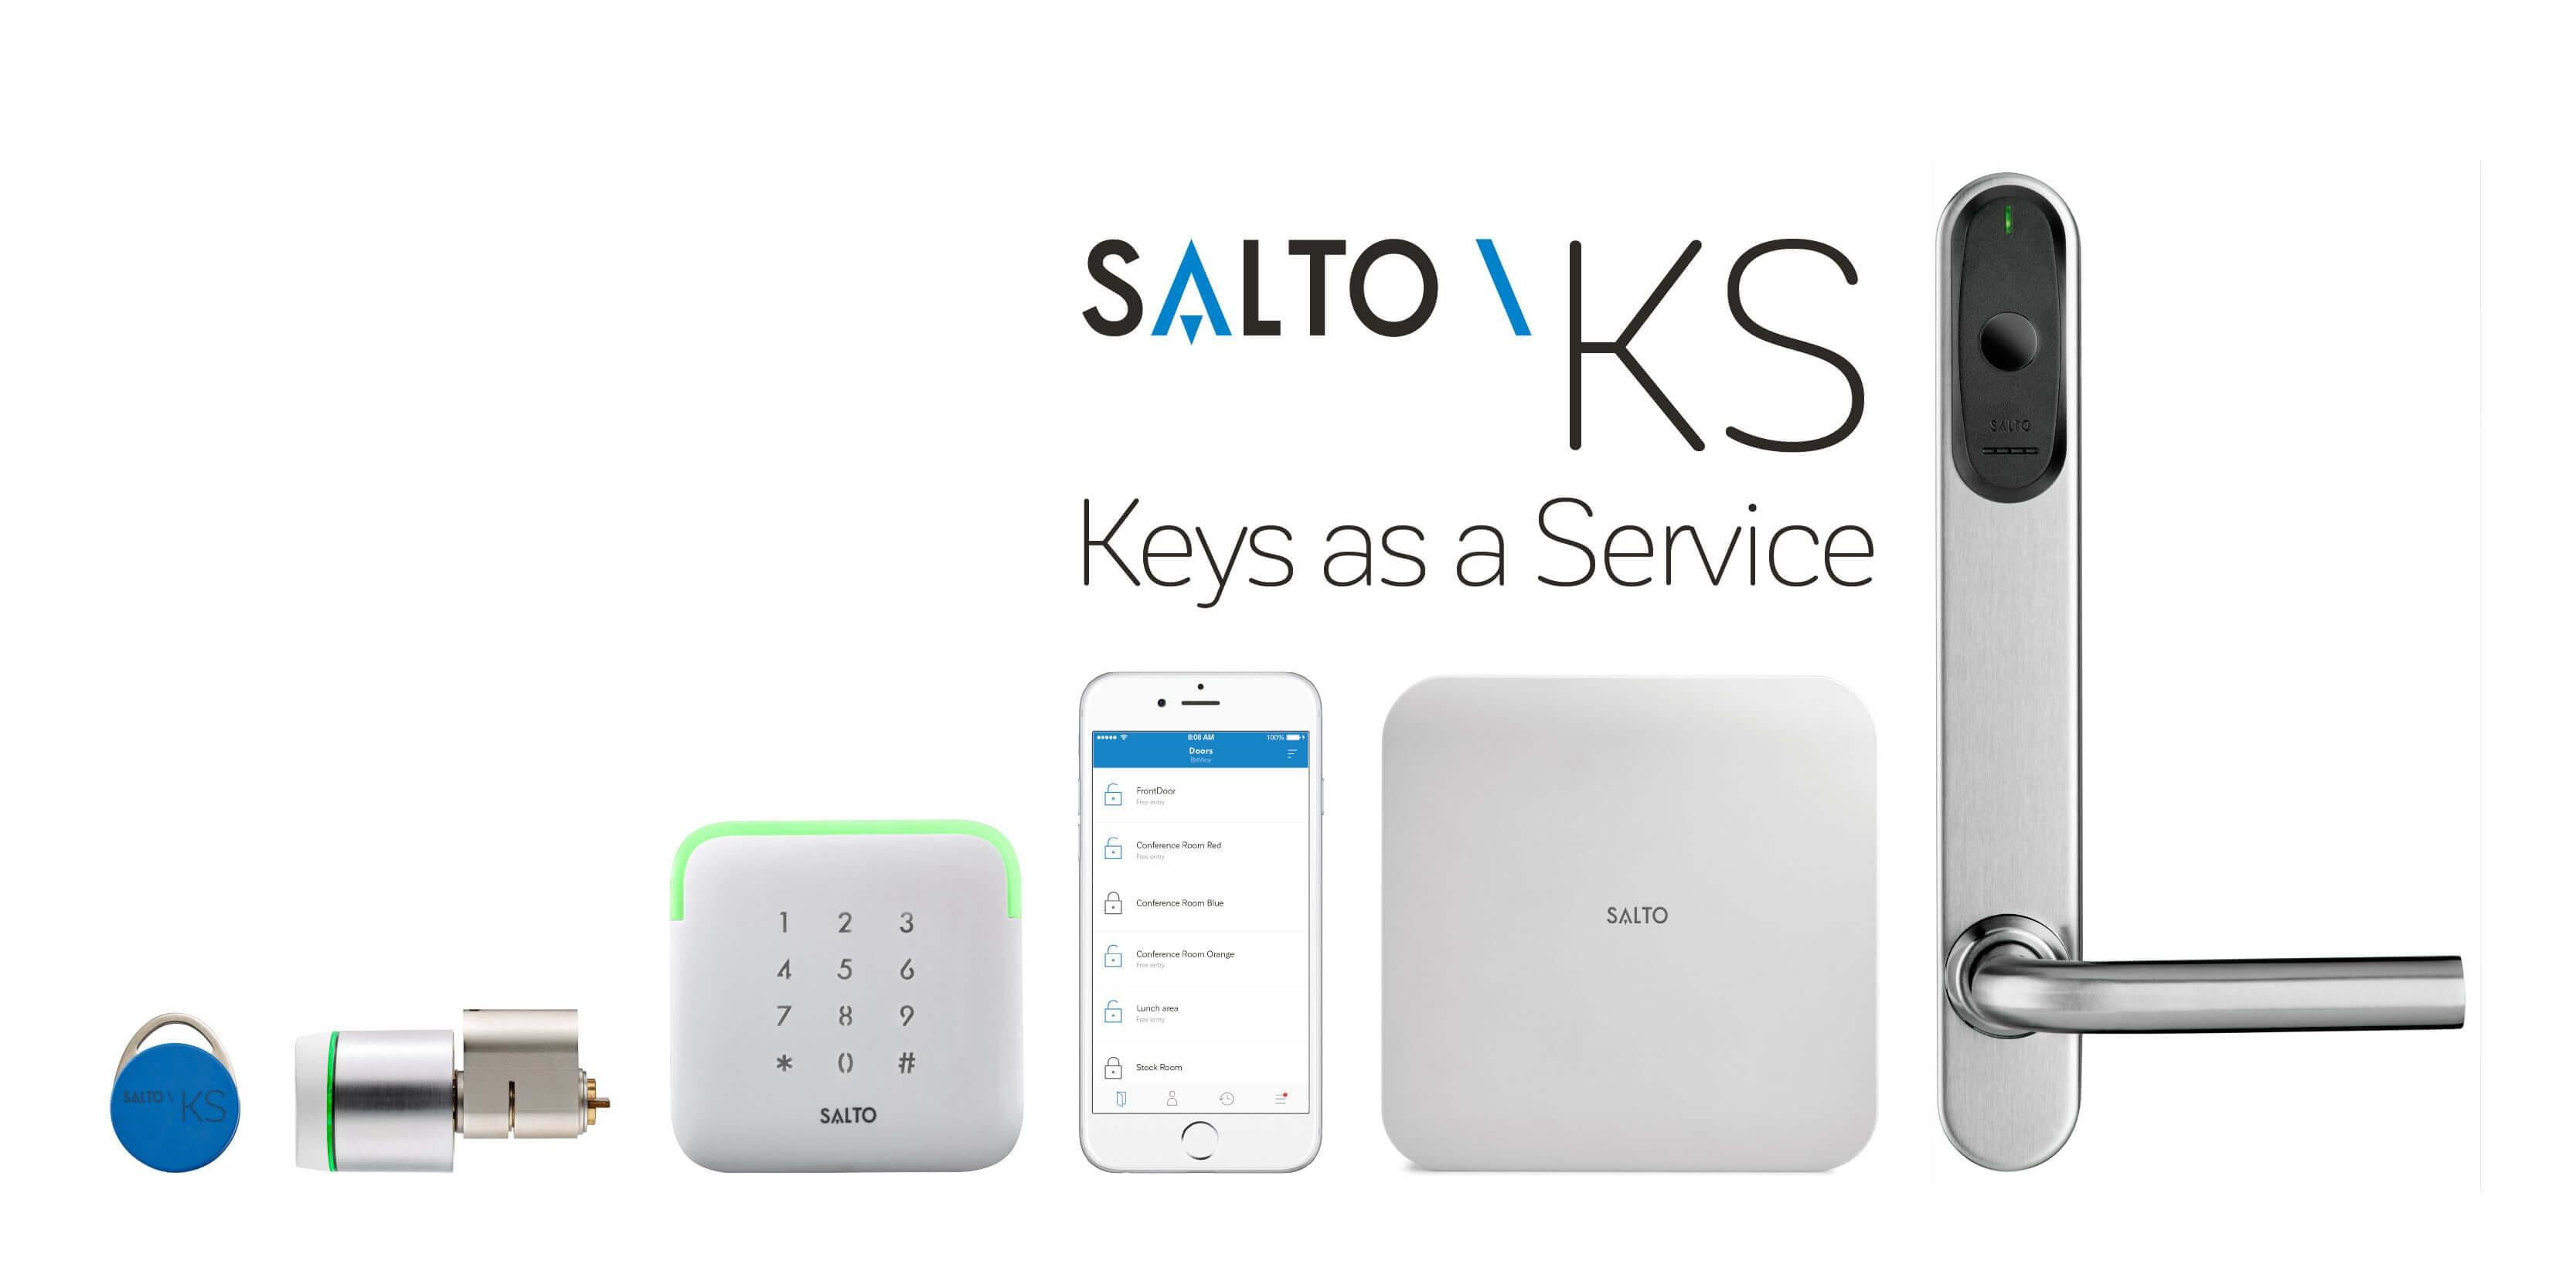 Salto KS coworking hackathon London